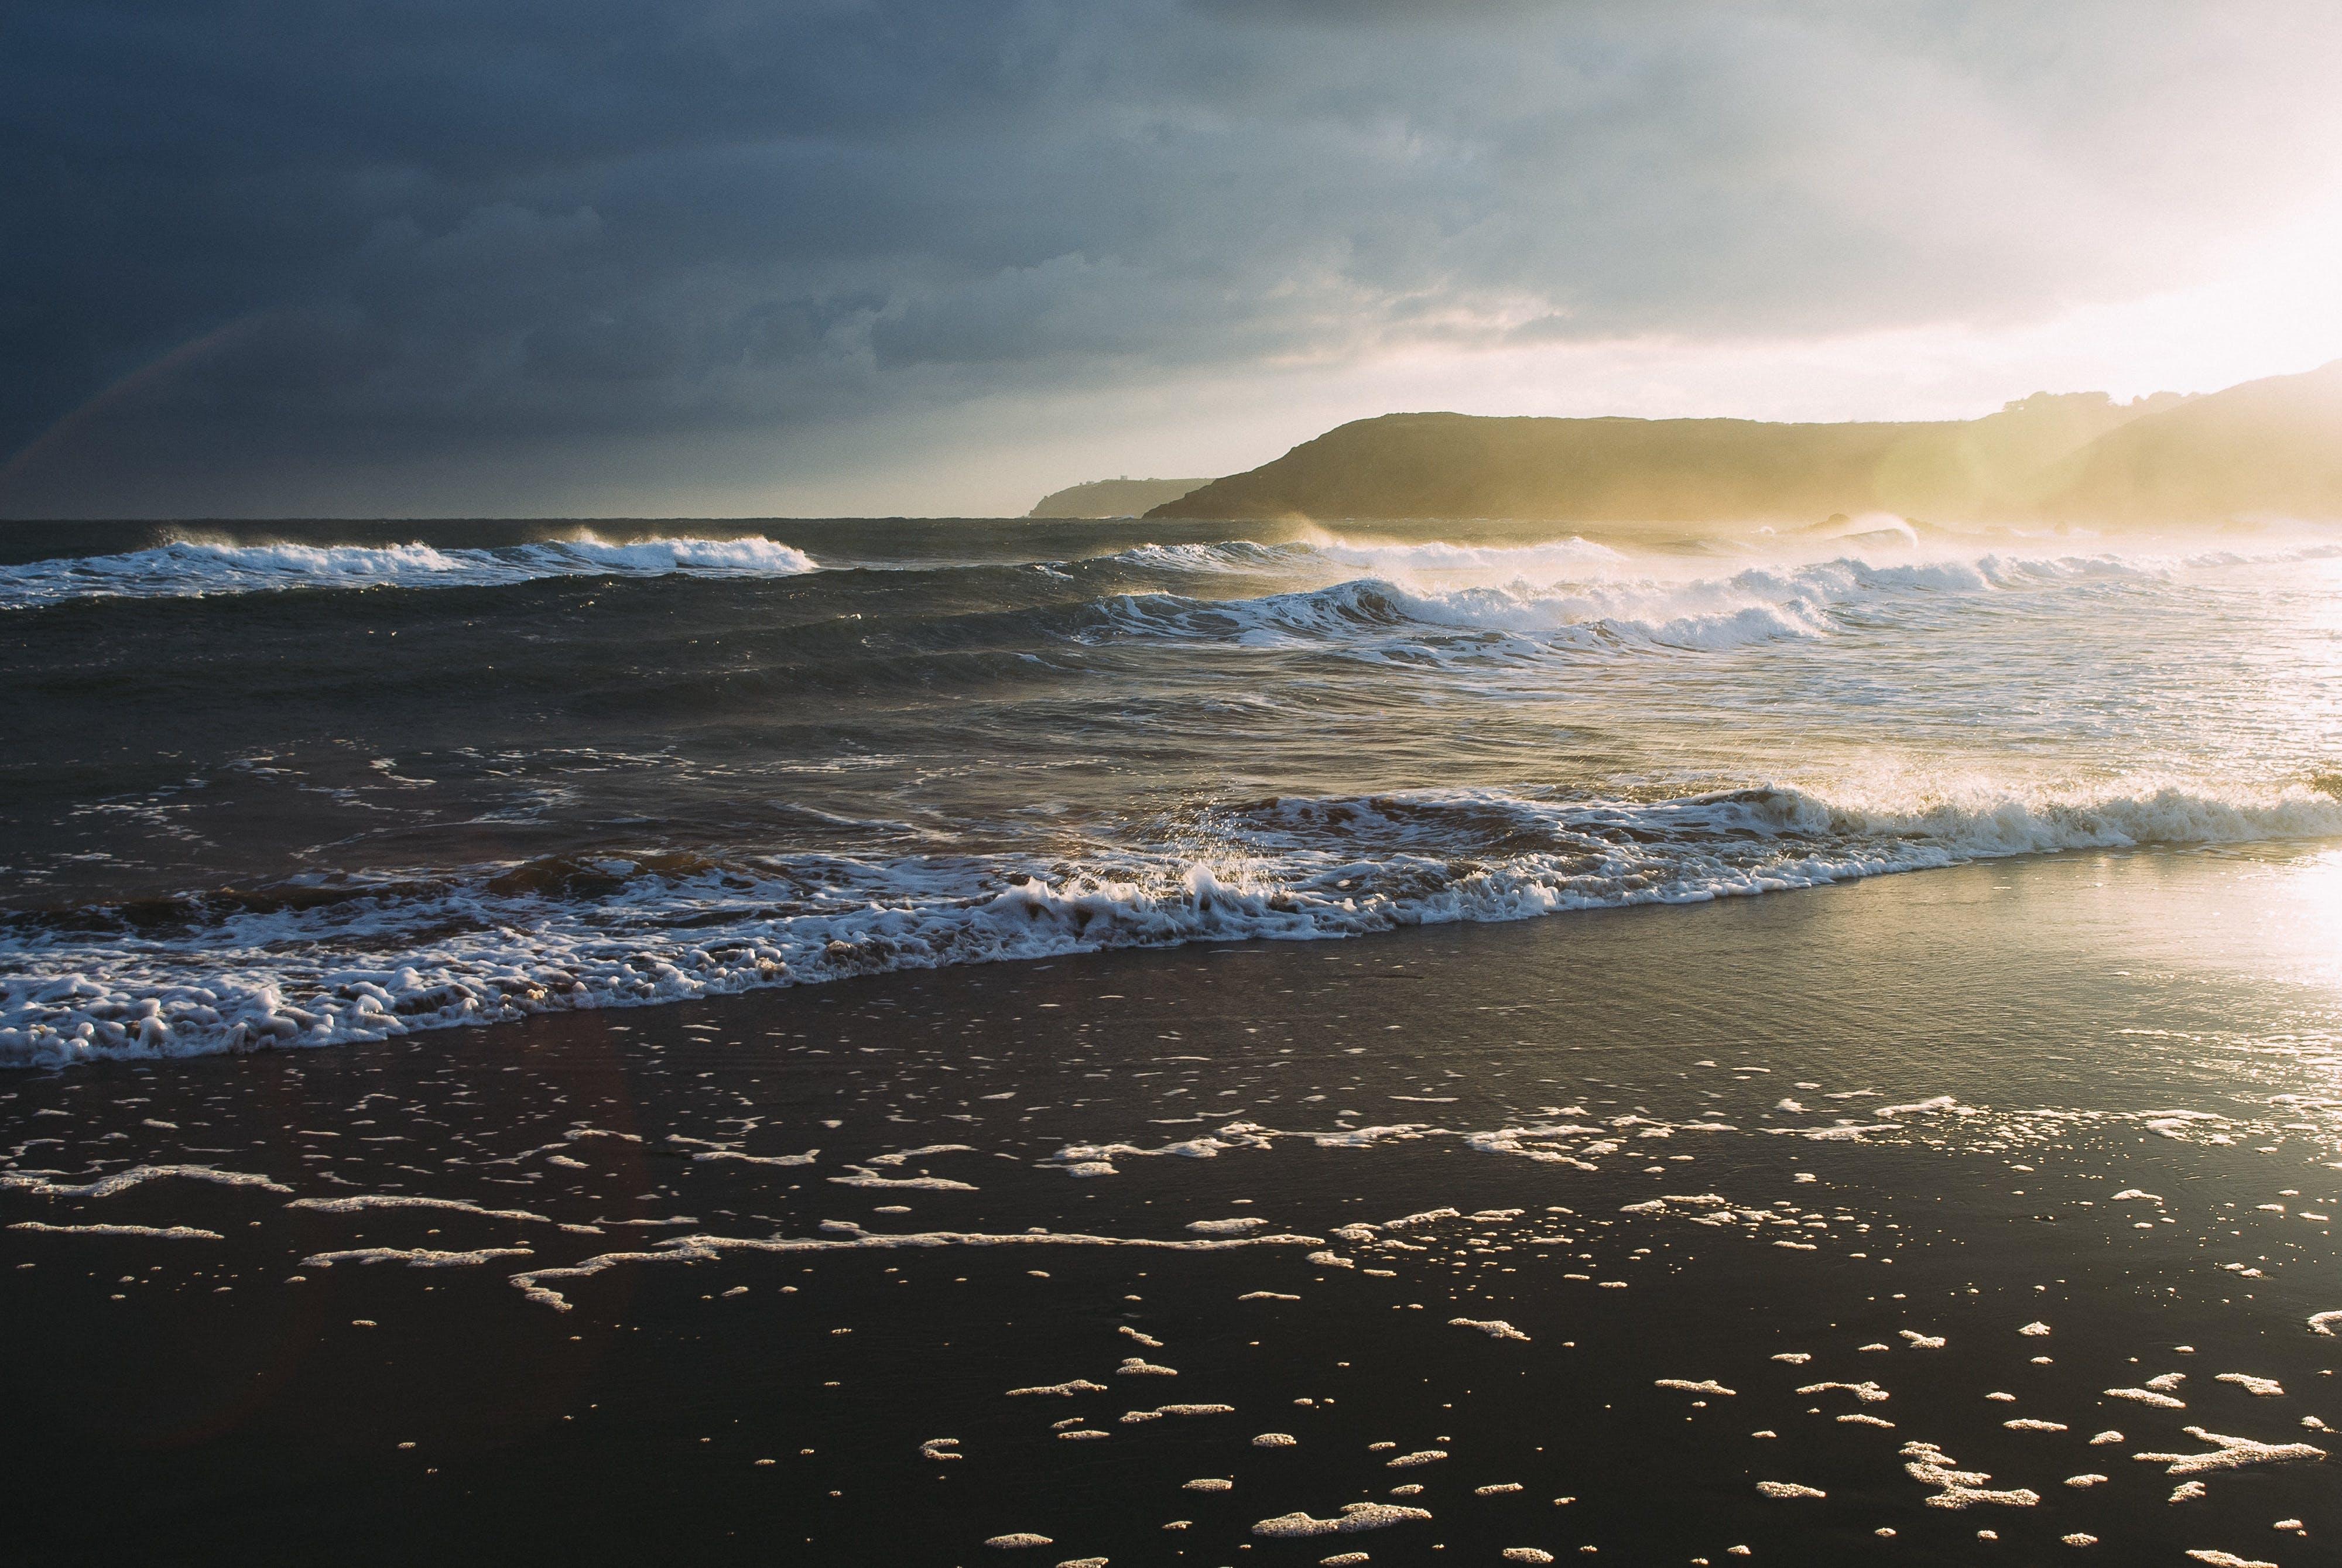 Free stock photo of sea, nature, beach, waves